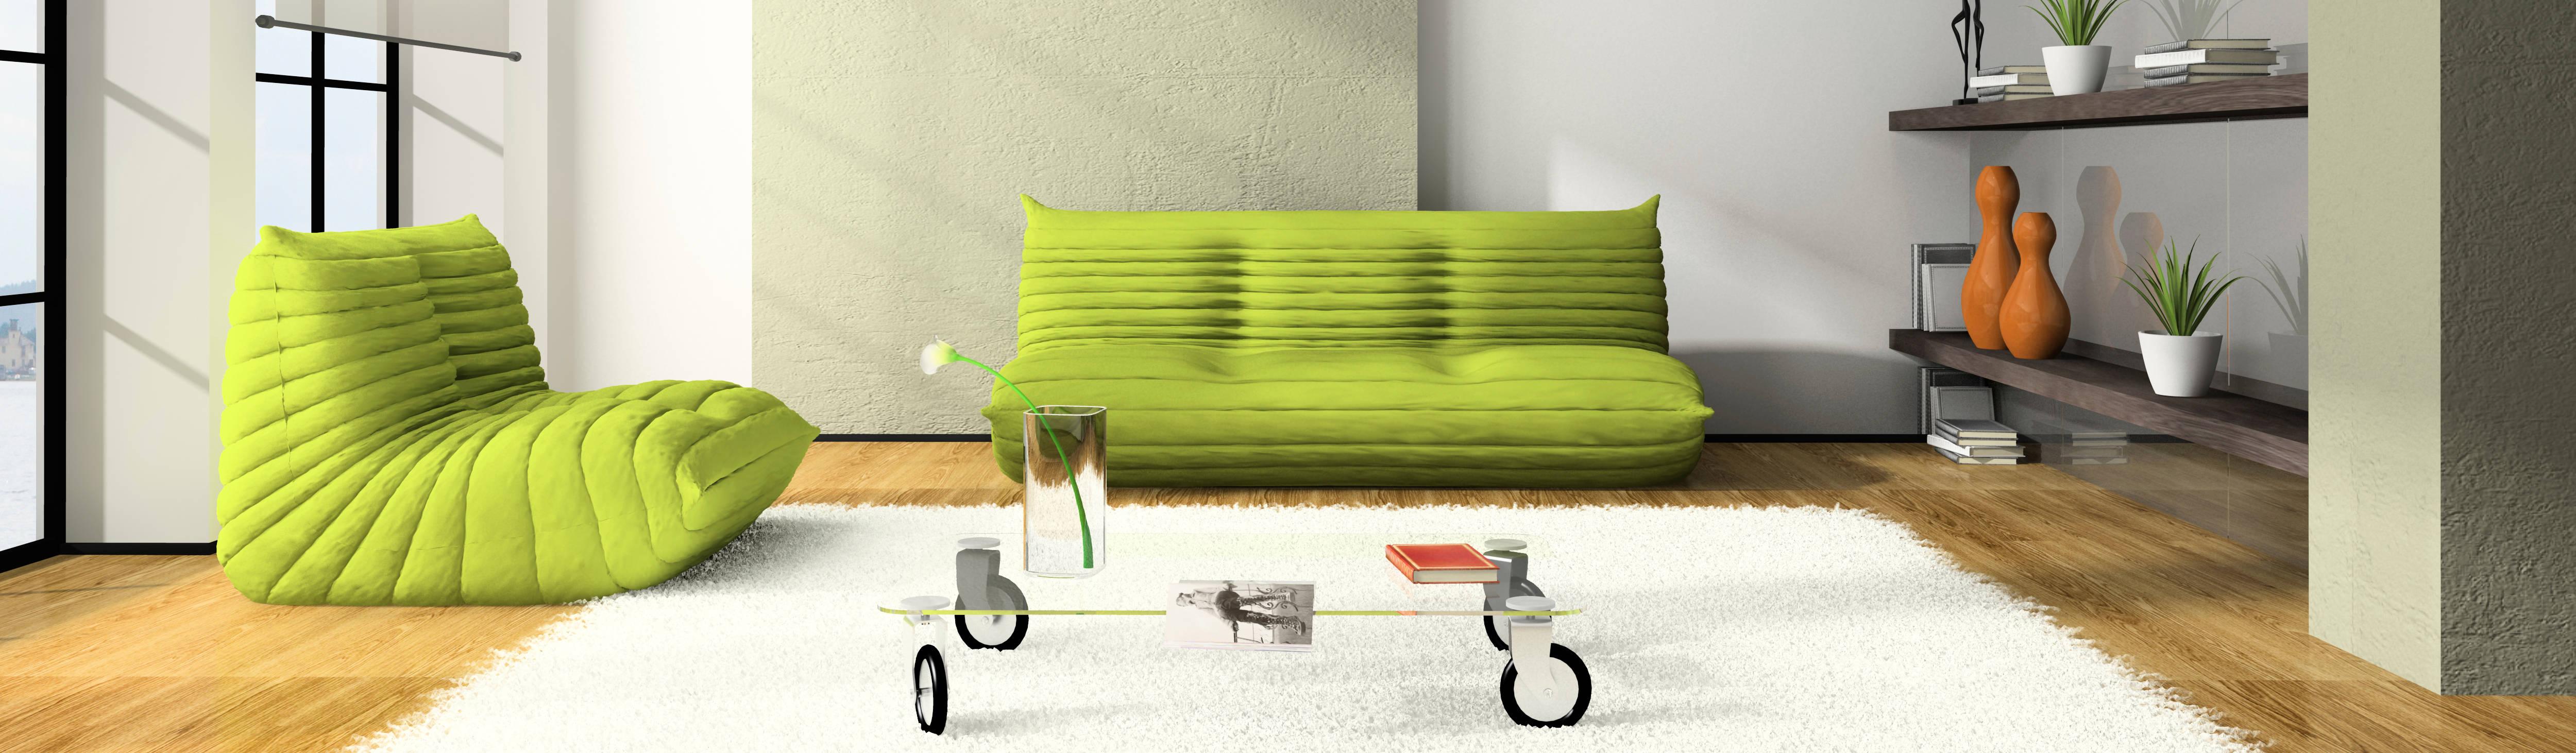 Wohnfühleffekt by Susanne Reuther